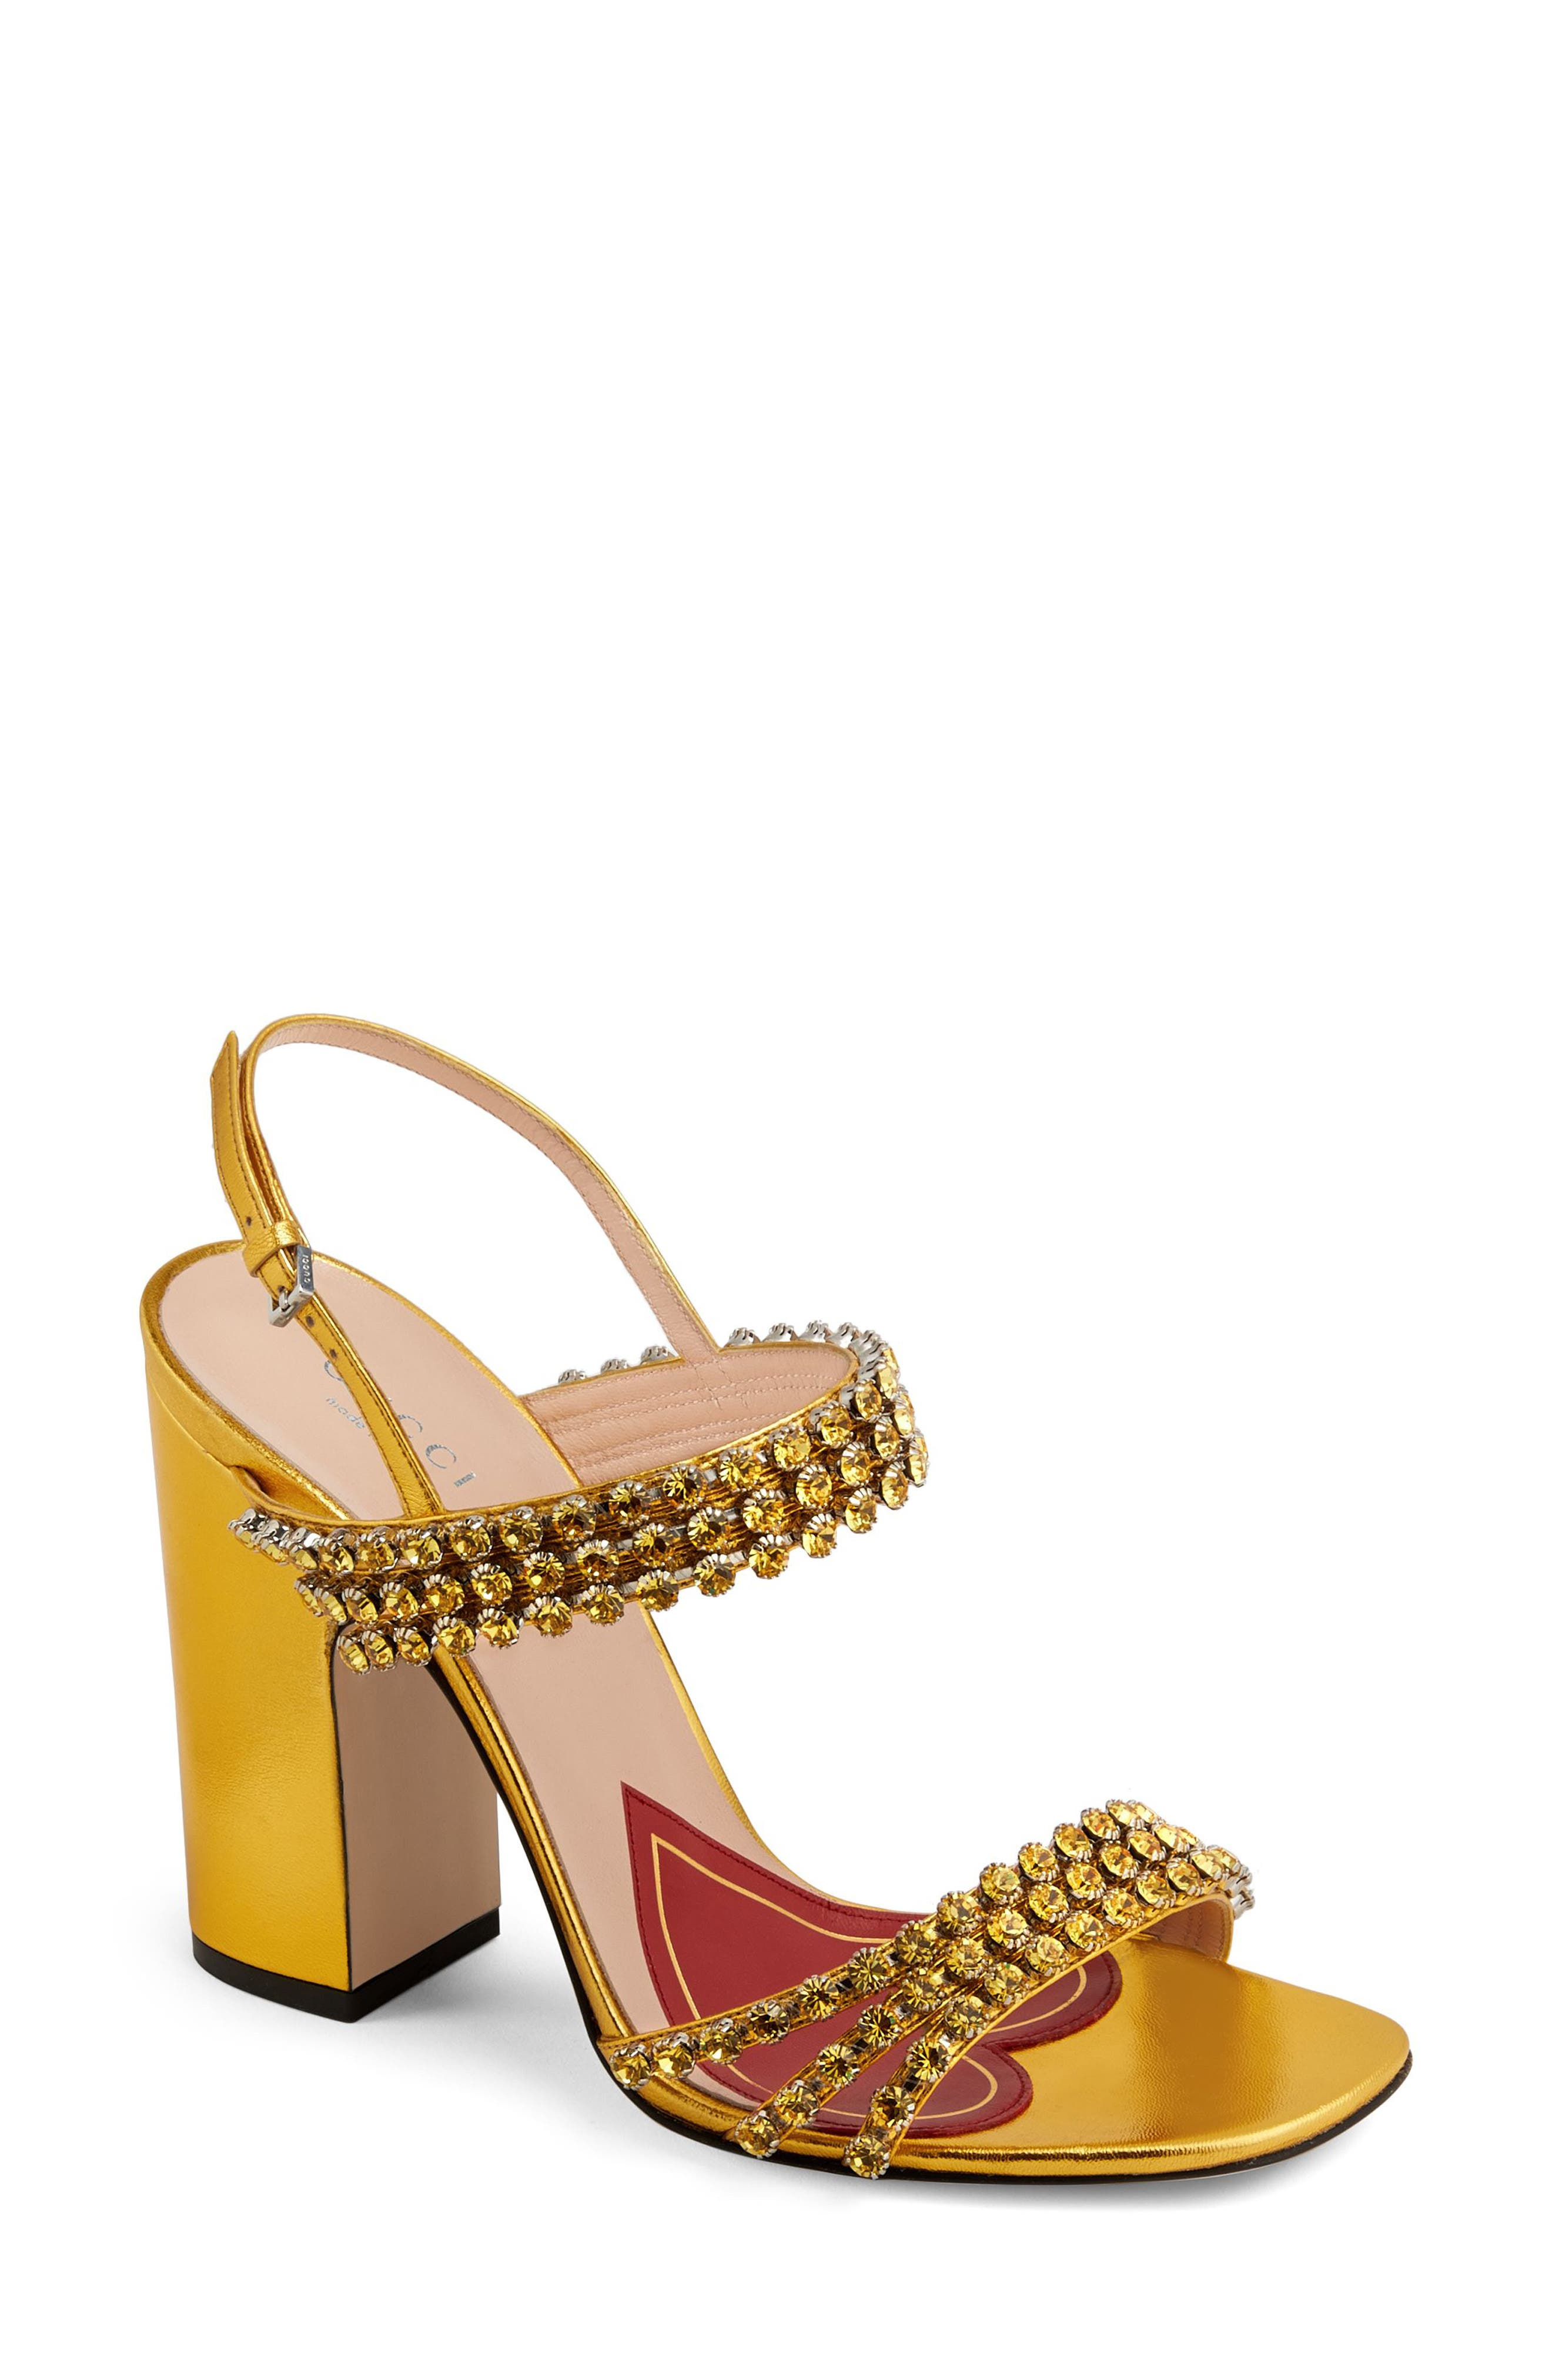 Bertie Jewel Sandal,                         Main,                         color, GOLD LEATHER